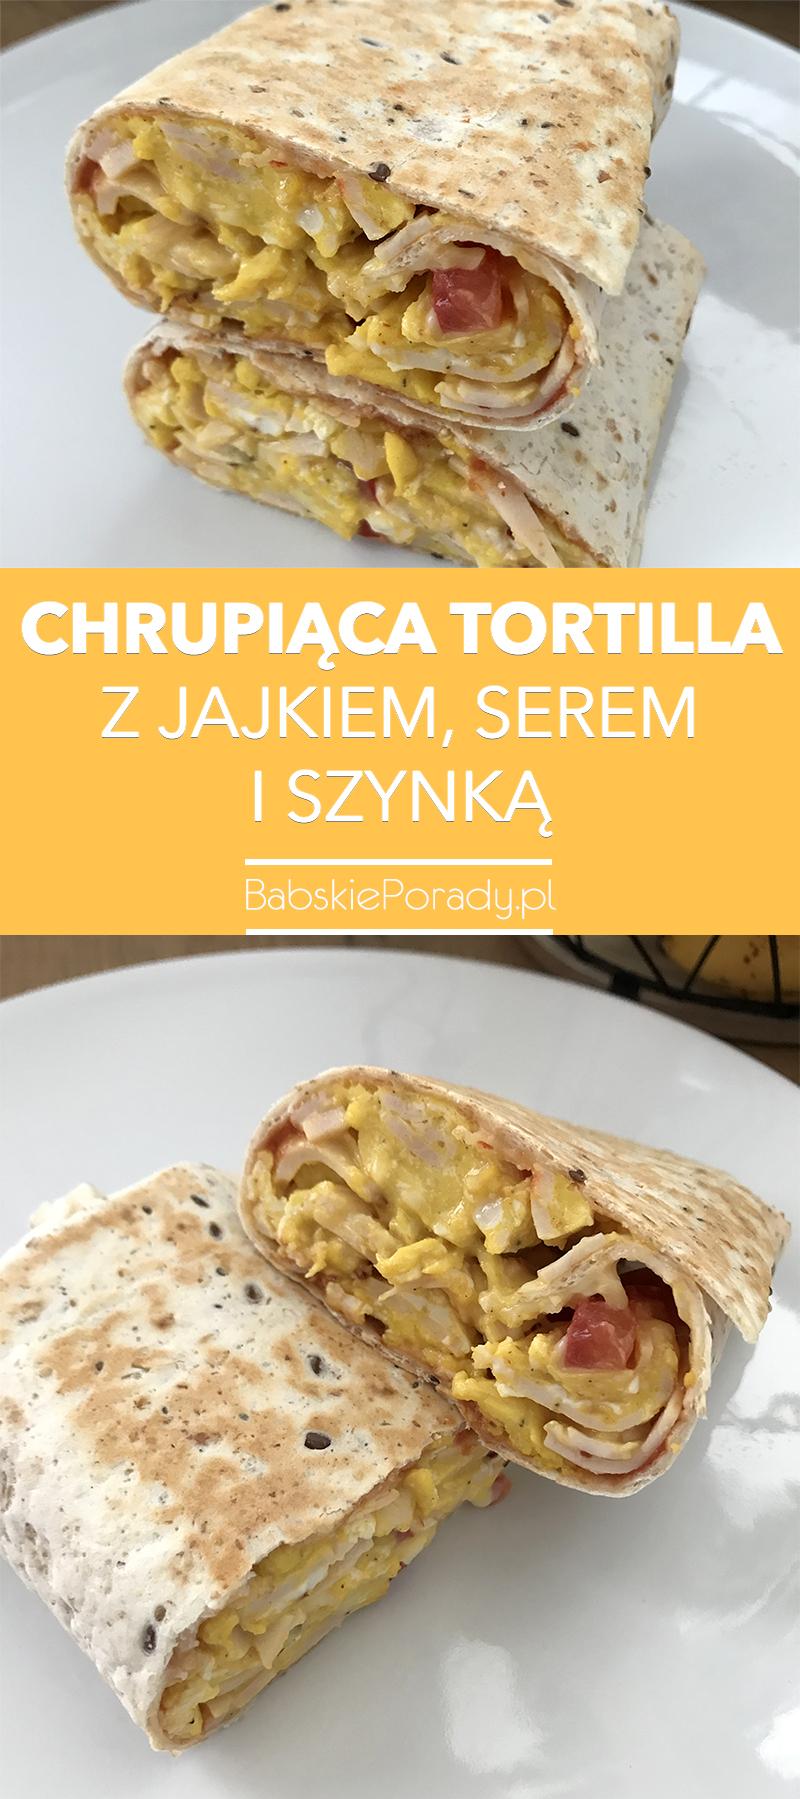 chrupiąca tortilla z jajkiem, serem i szynką, tortilla z jajem, tortilla z jajkiem i szynką